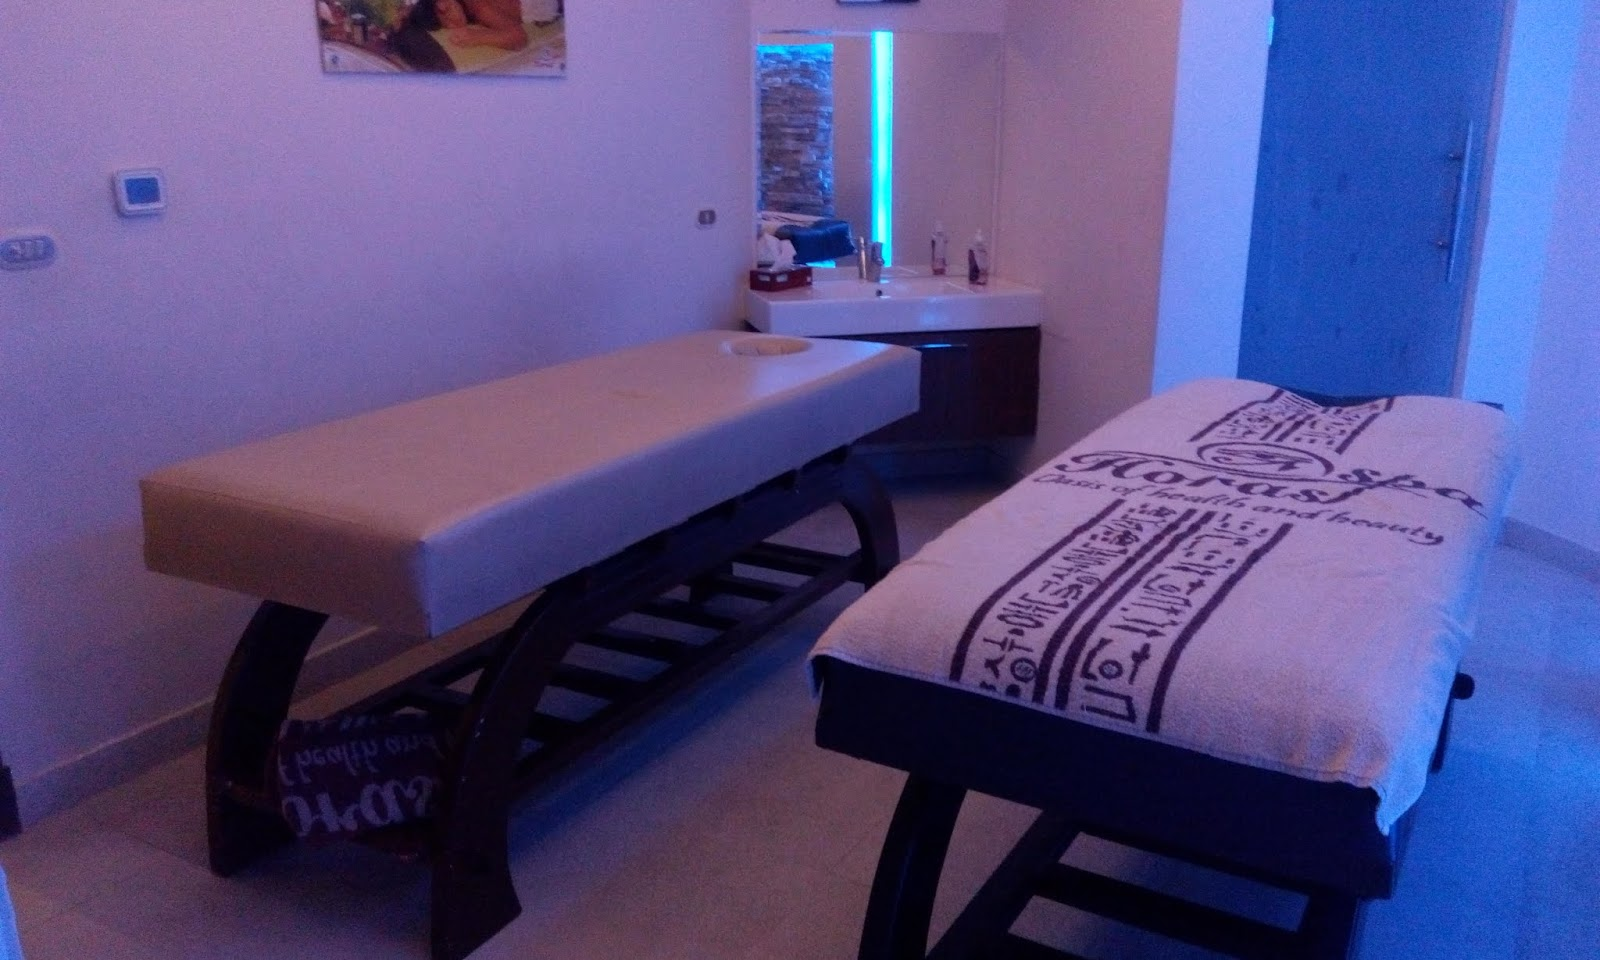 Full Service Body Massage